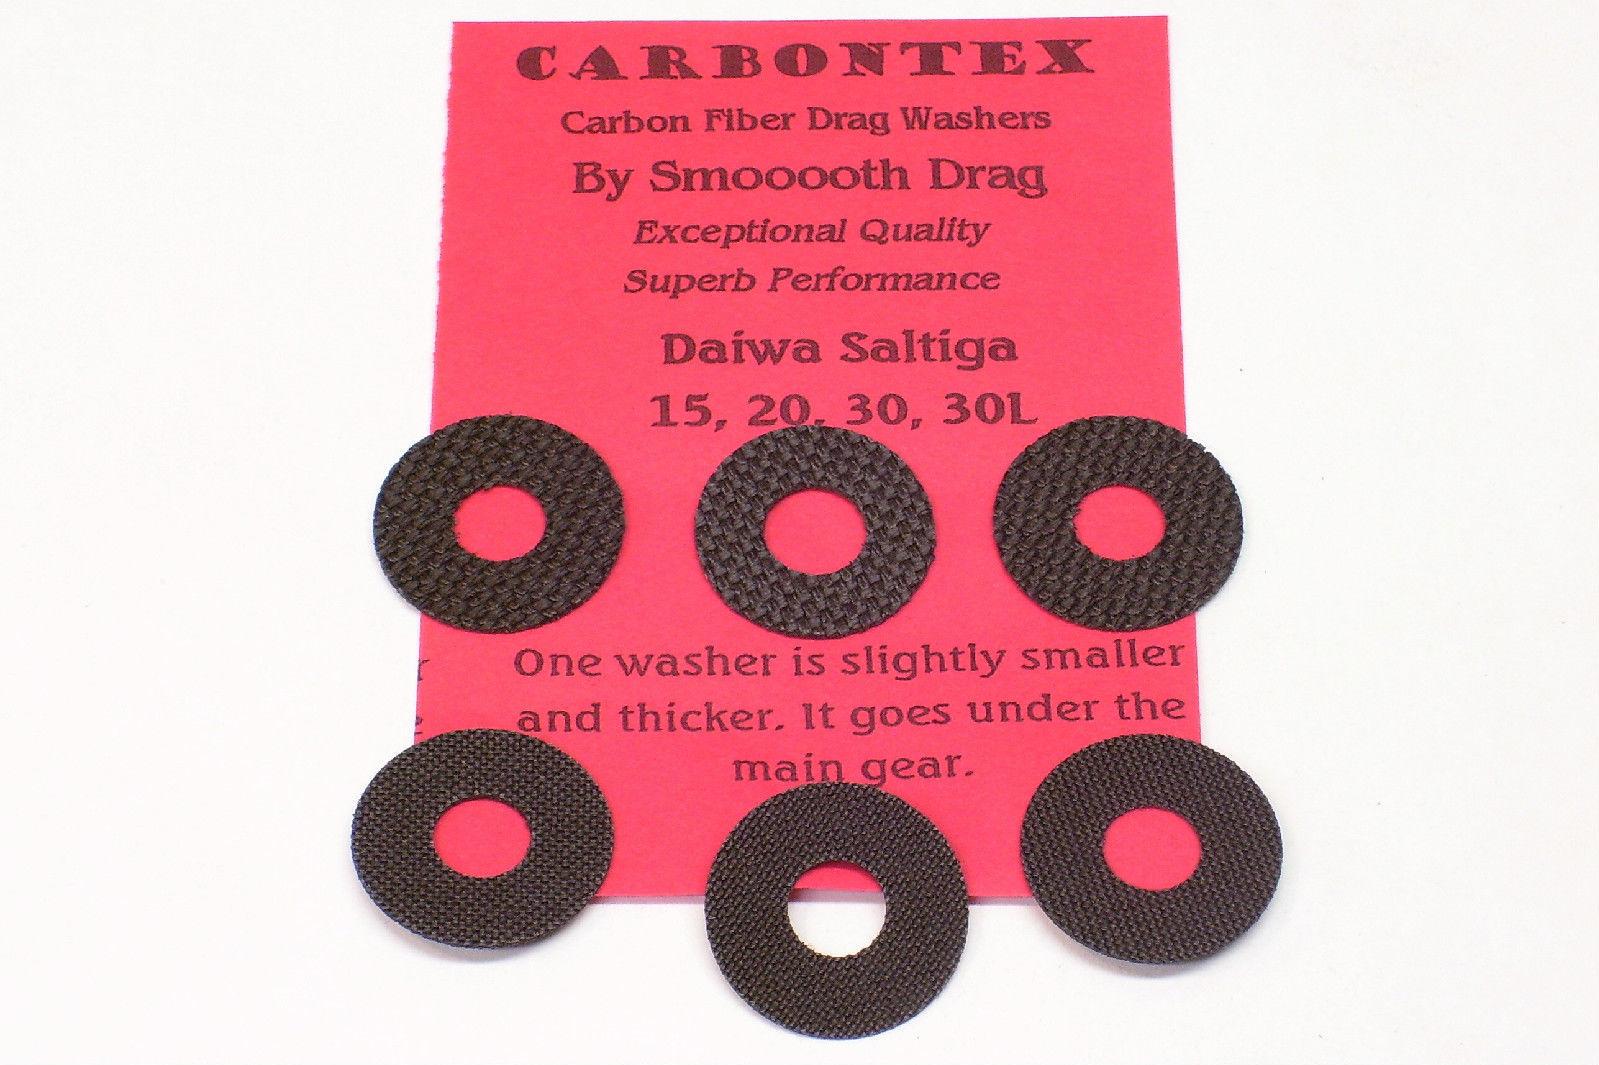 1 Set Carbontex Drag Washers Fits Penn International 955 and 965